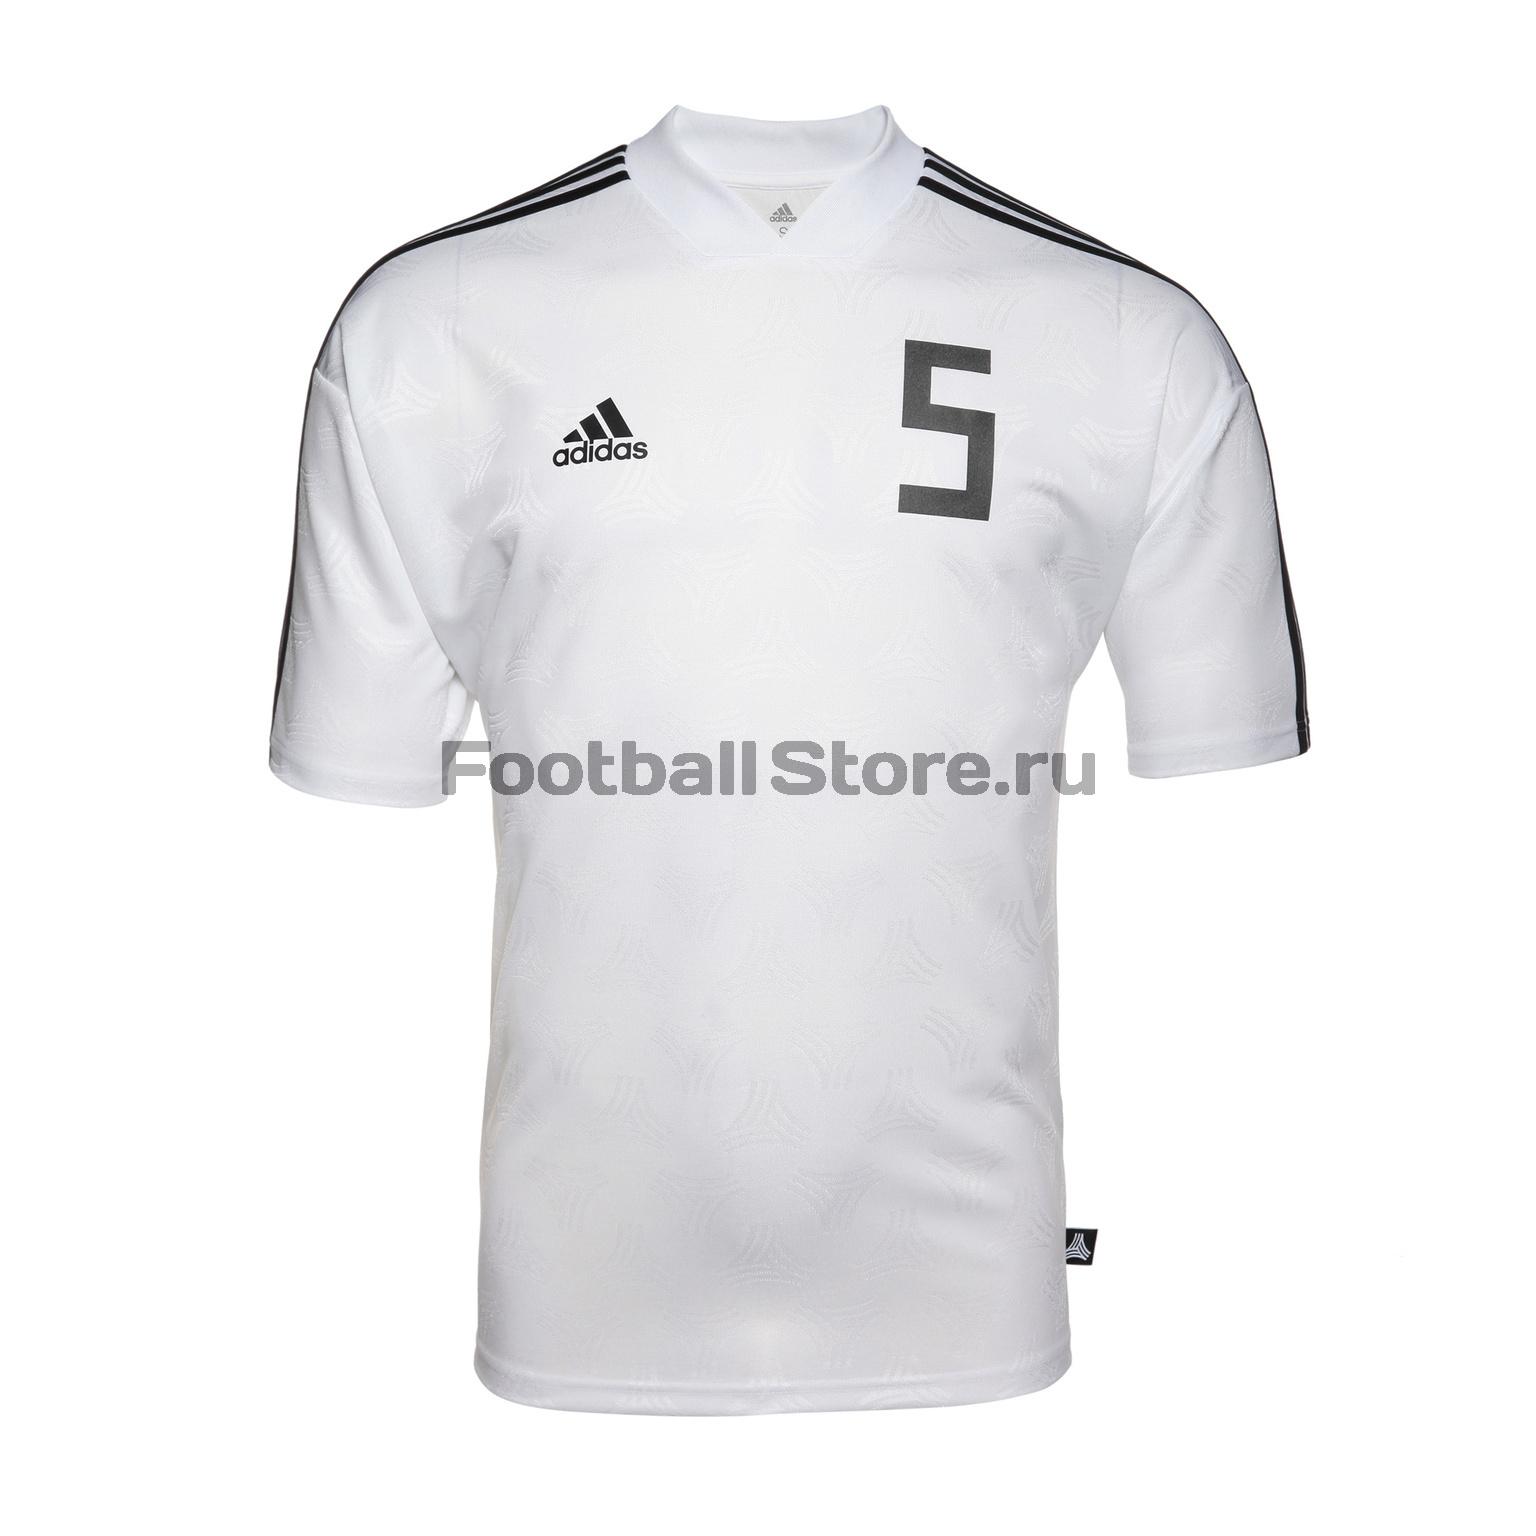 Футболка тренировочная Adidas Tanip Icon JSY CG1801